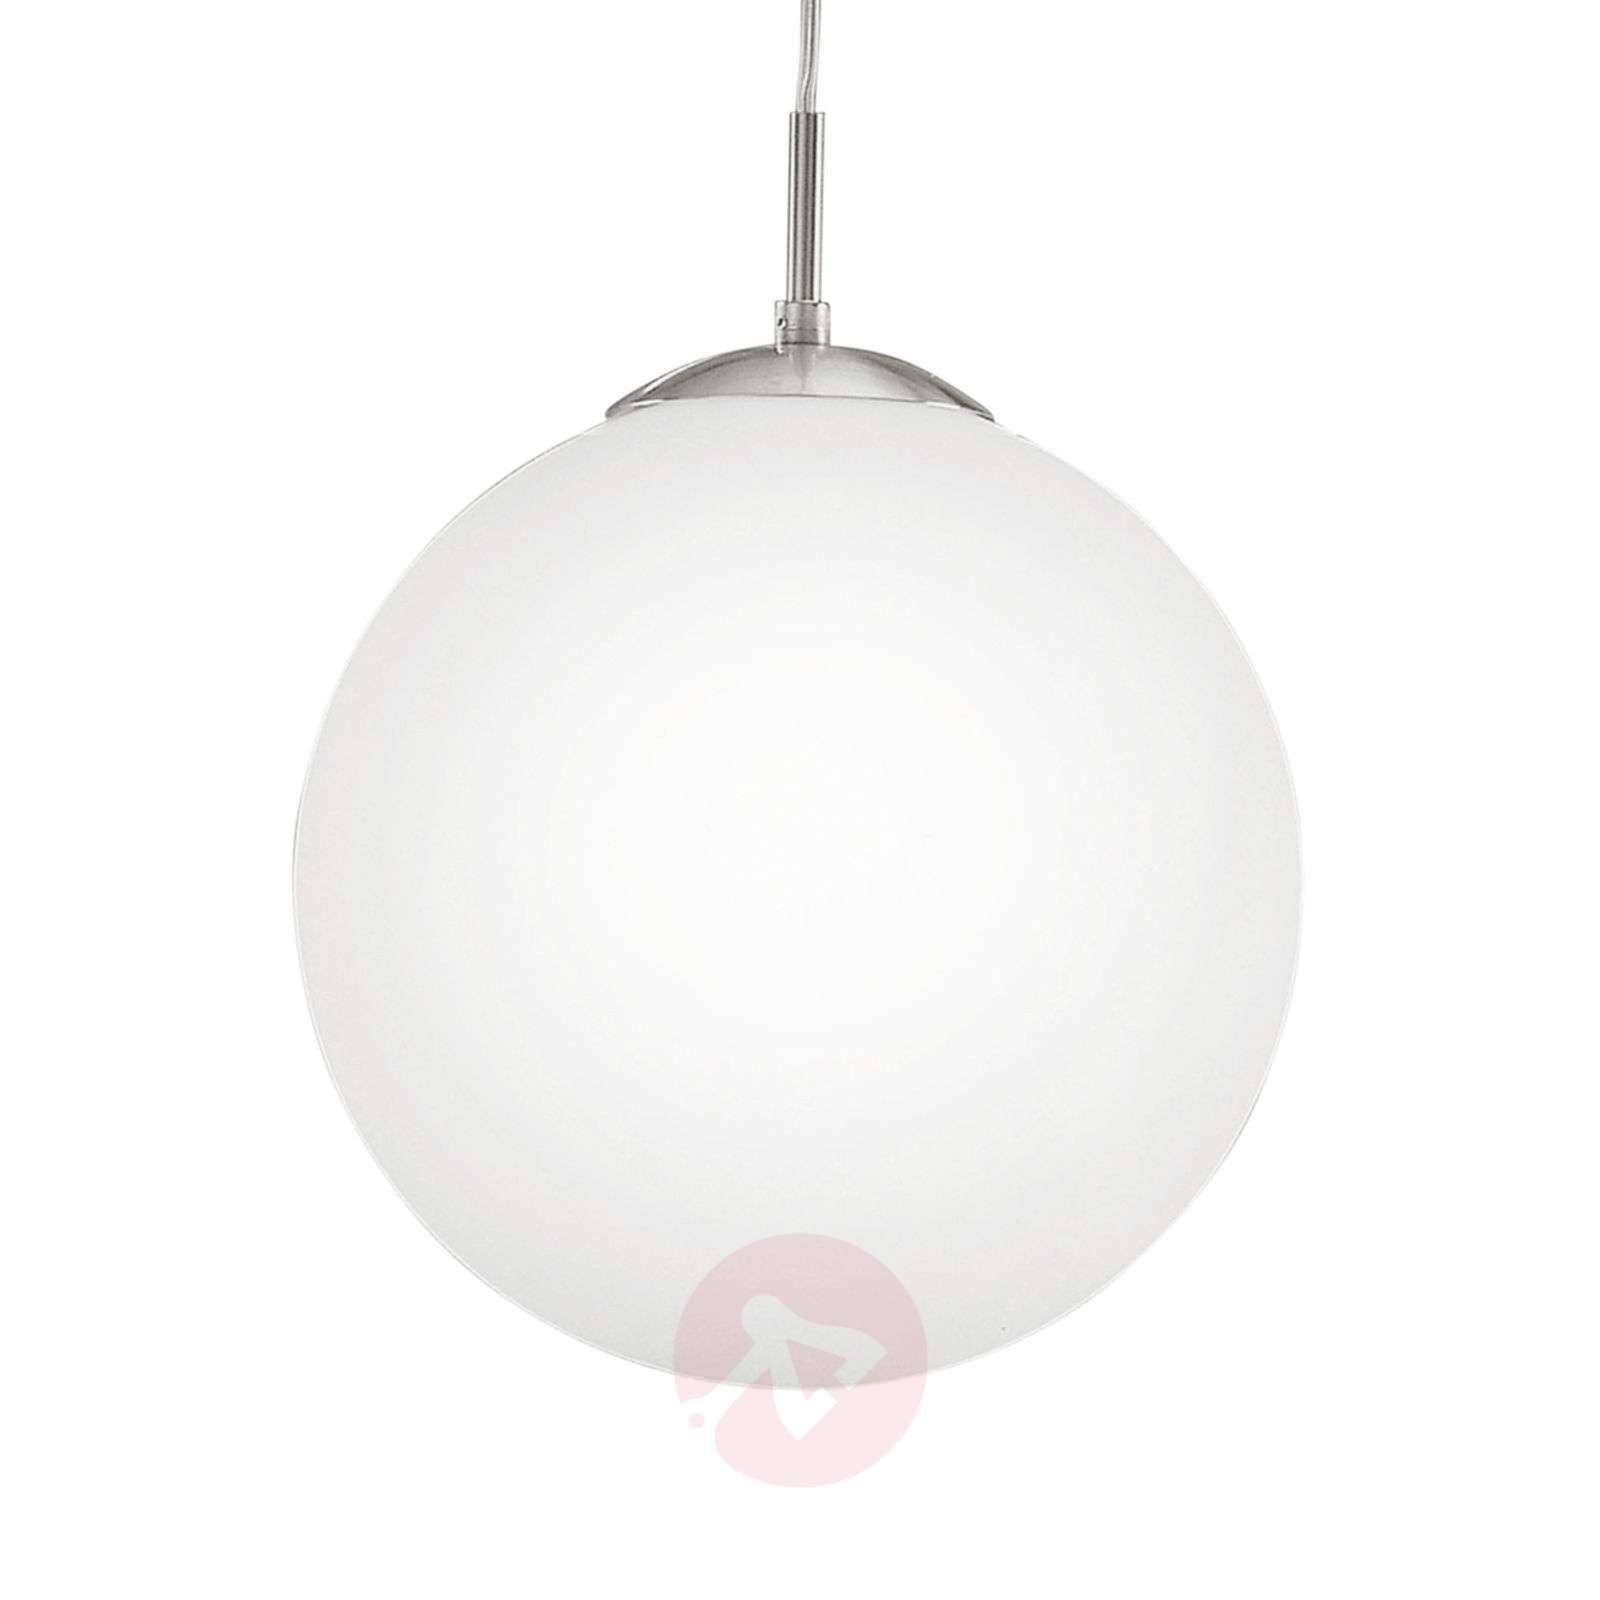 Elegantti Rondo-riippuvalaisin-3031252X-01